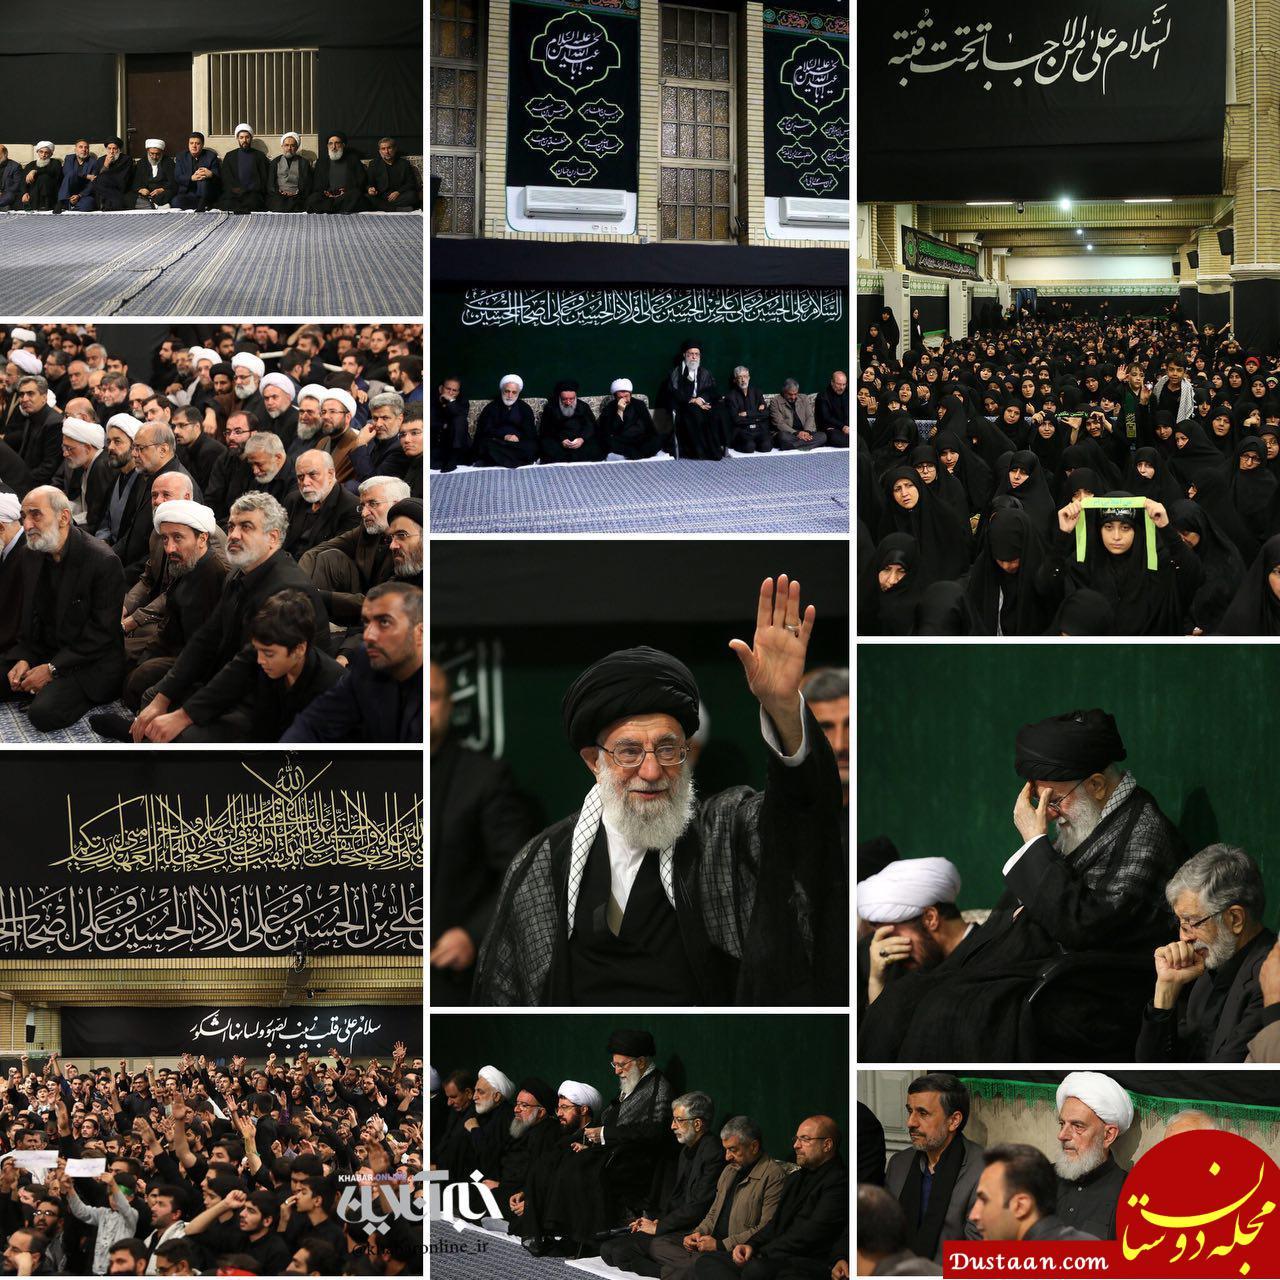 www.dustaan.com از قالیباف تا احمدی نژاد در عزاداری شام غریبان +عکس